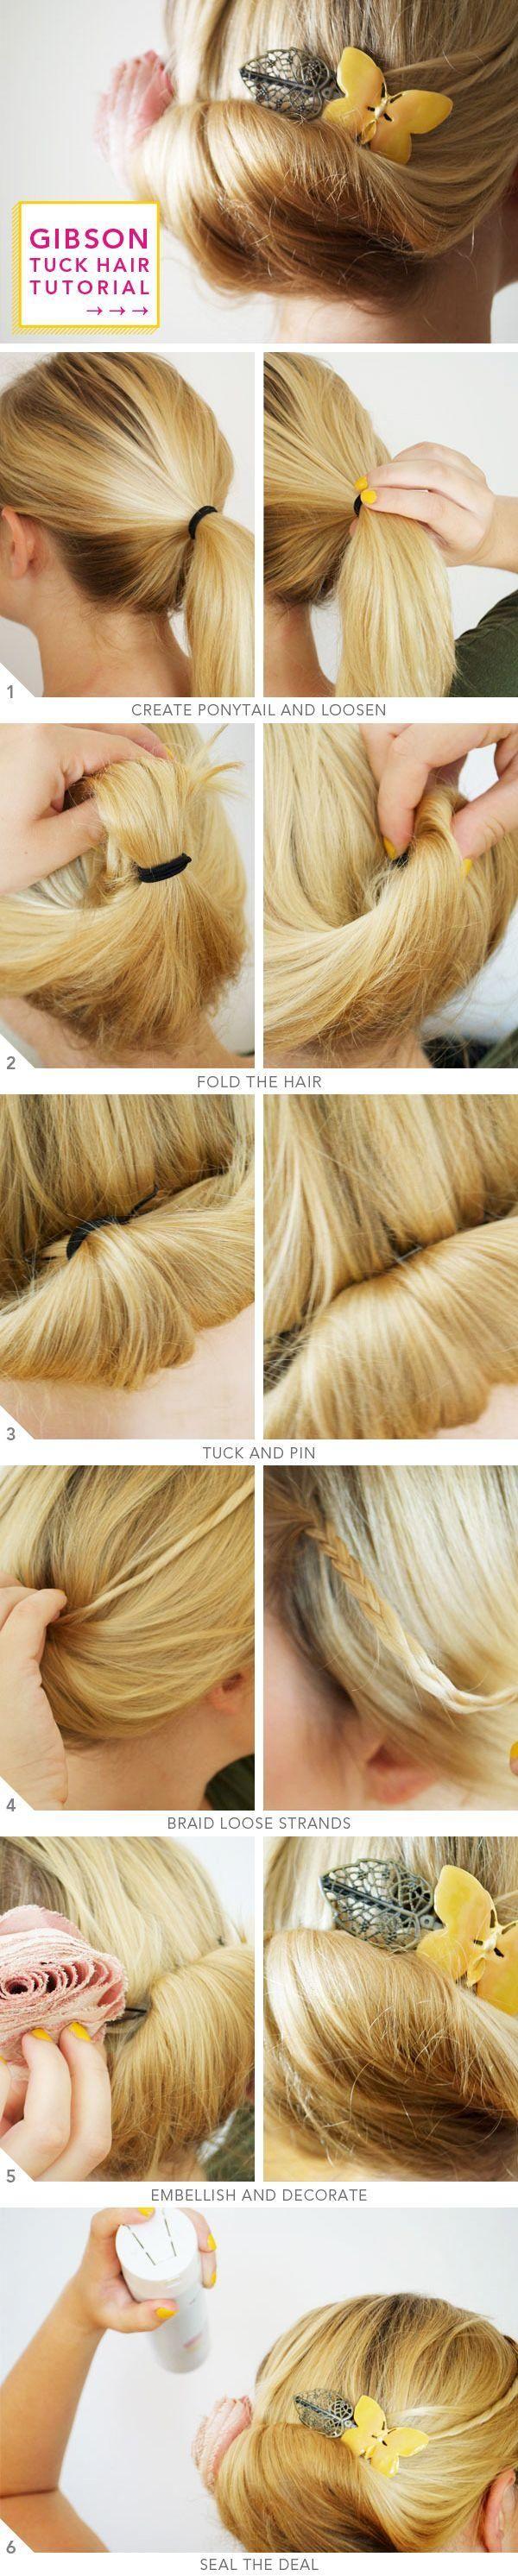 best diy images on pinterest beauty tips blade and feminine